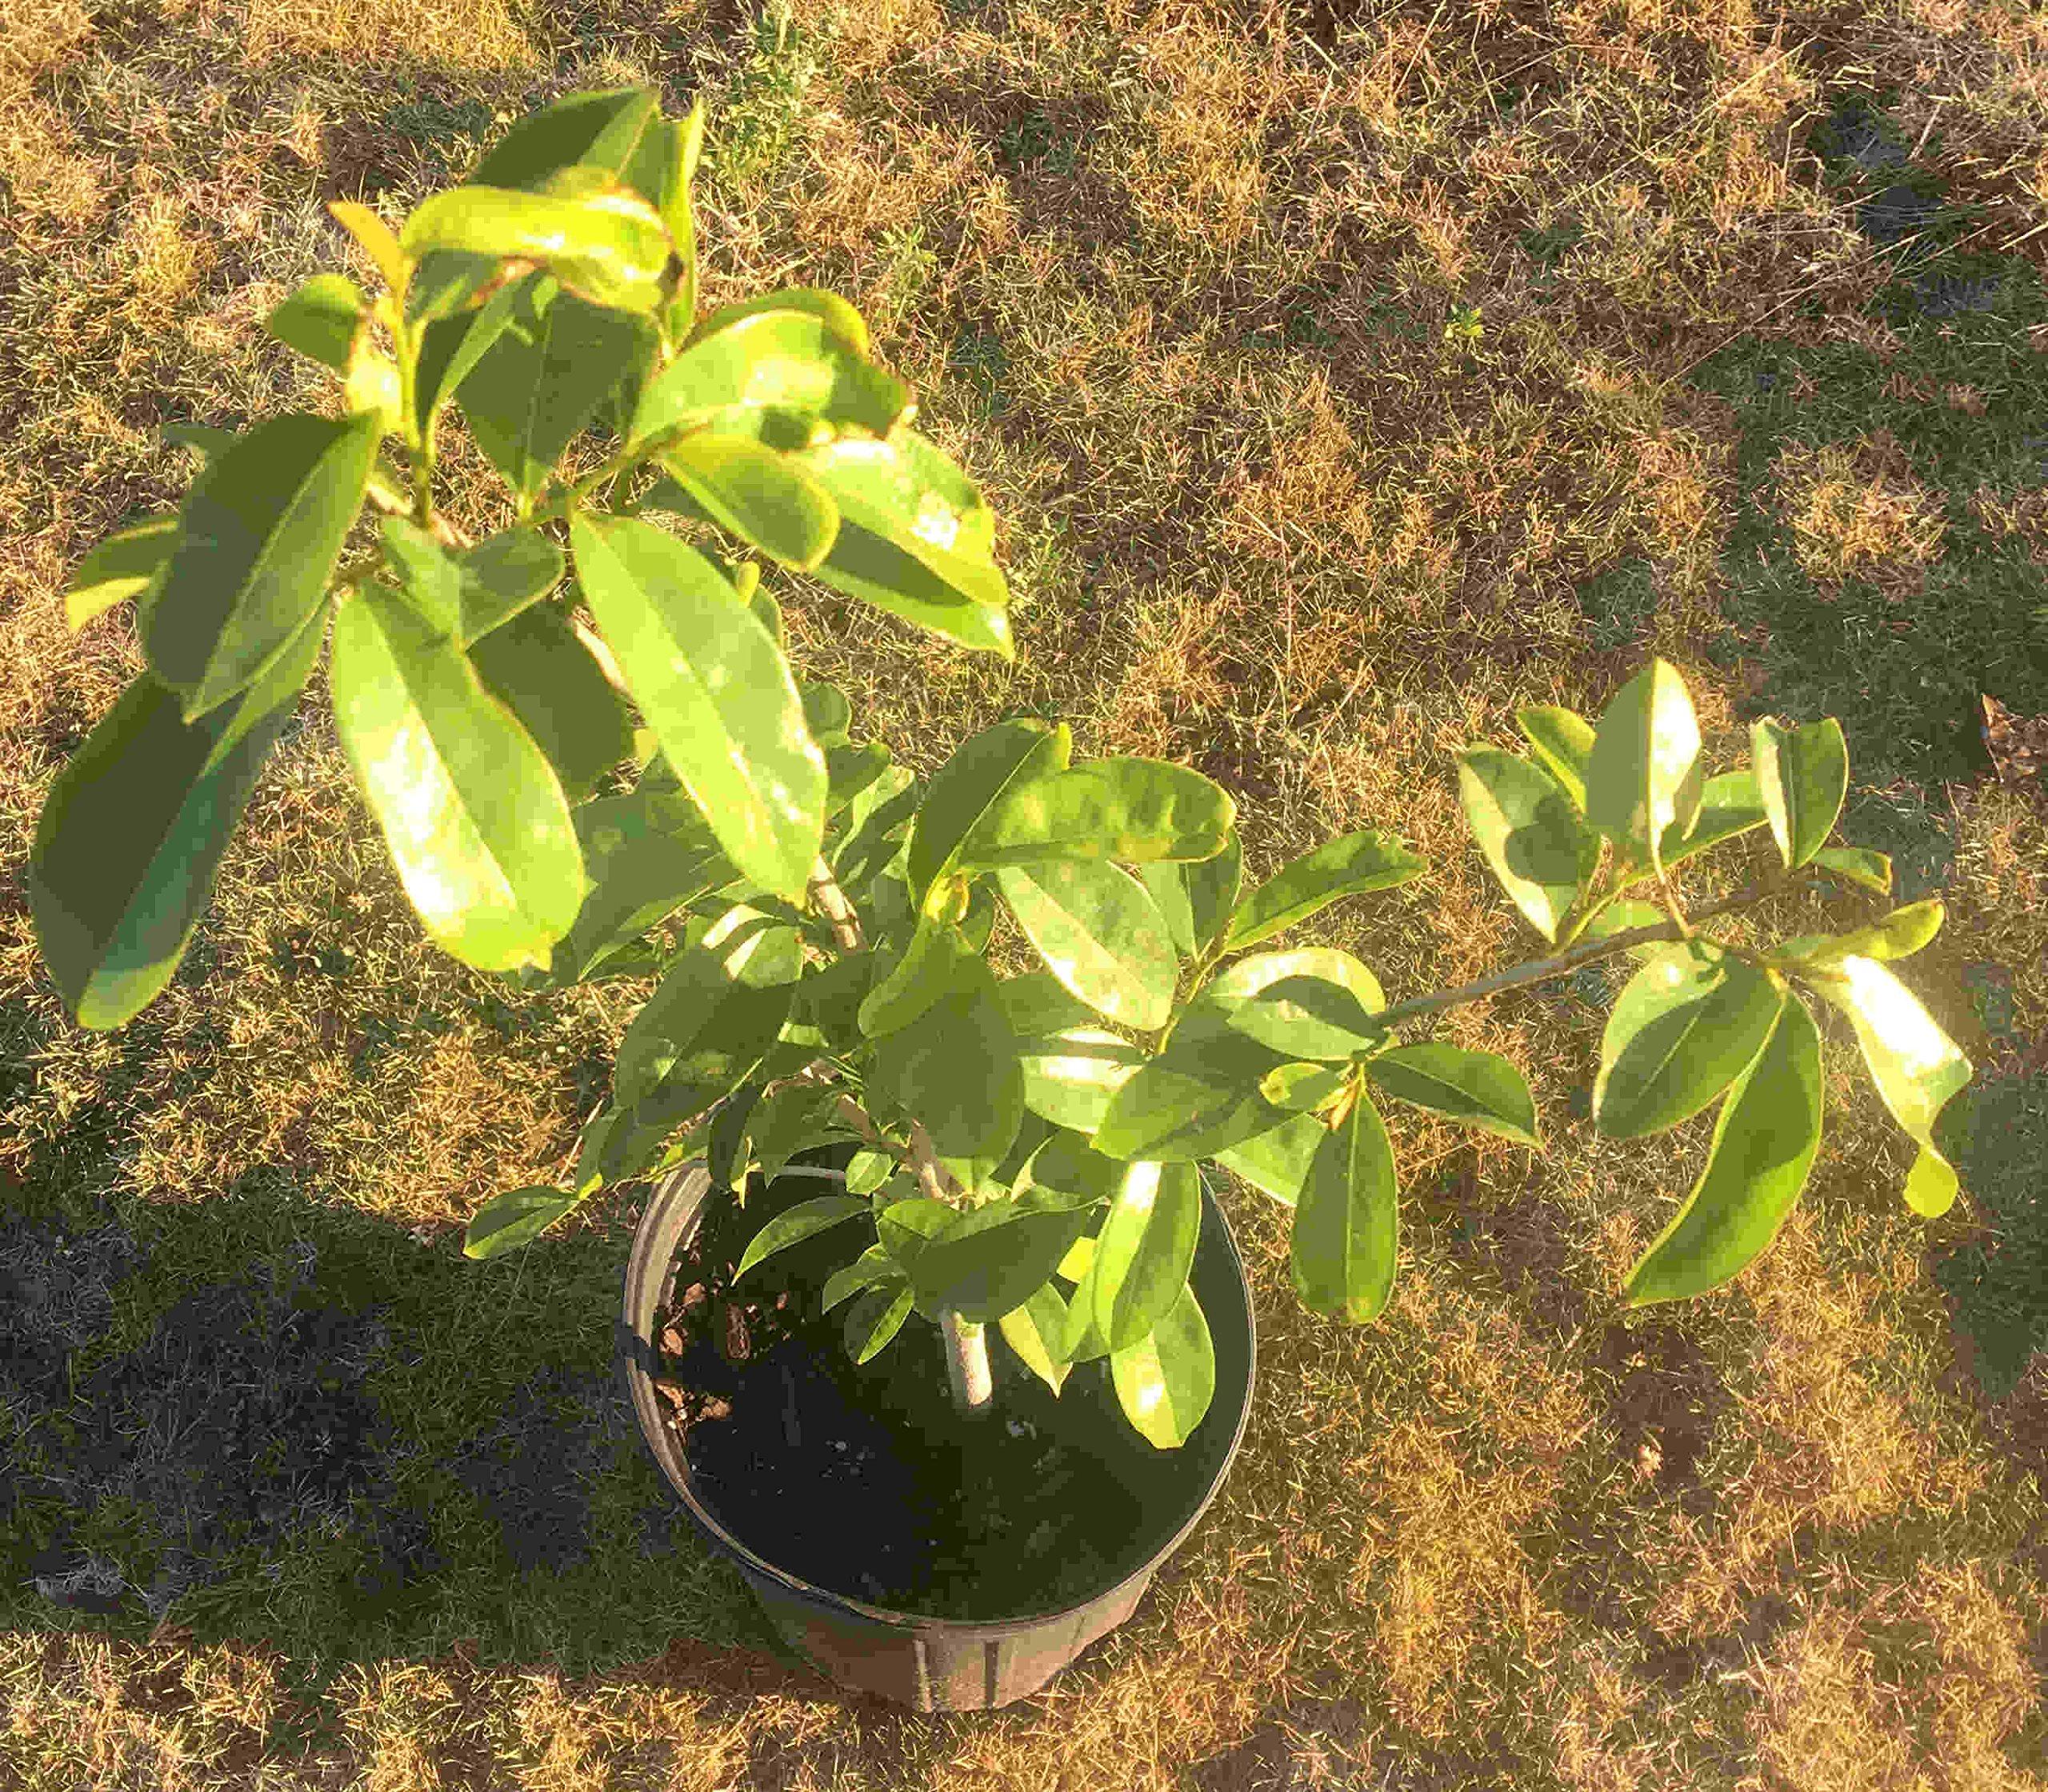 Soursop Guanabana Fruit Tree 2 Feet Tall, No Ship to CA, TX, AZ by SOURSOP (Image #1)